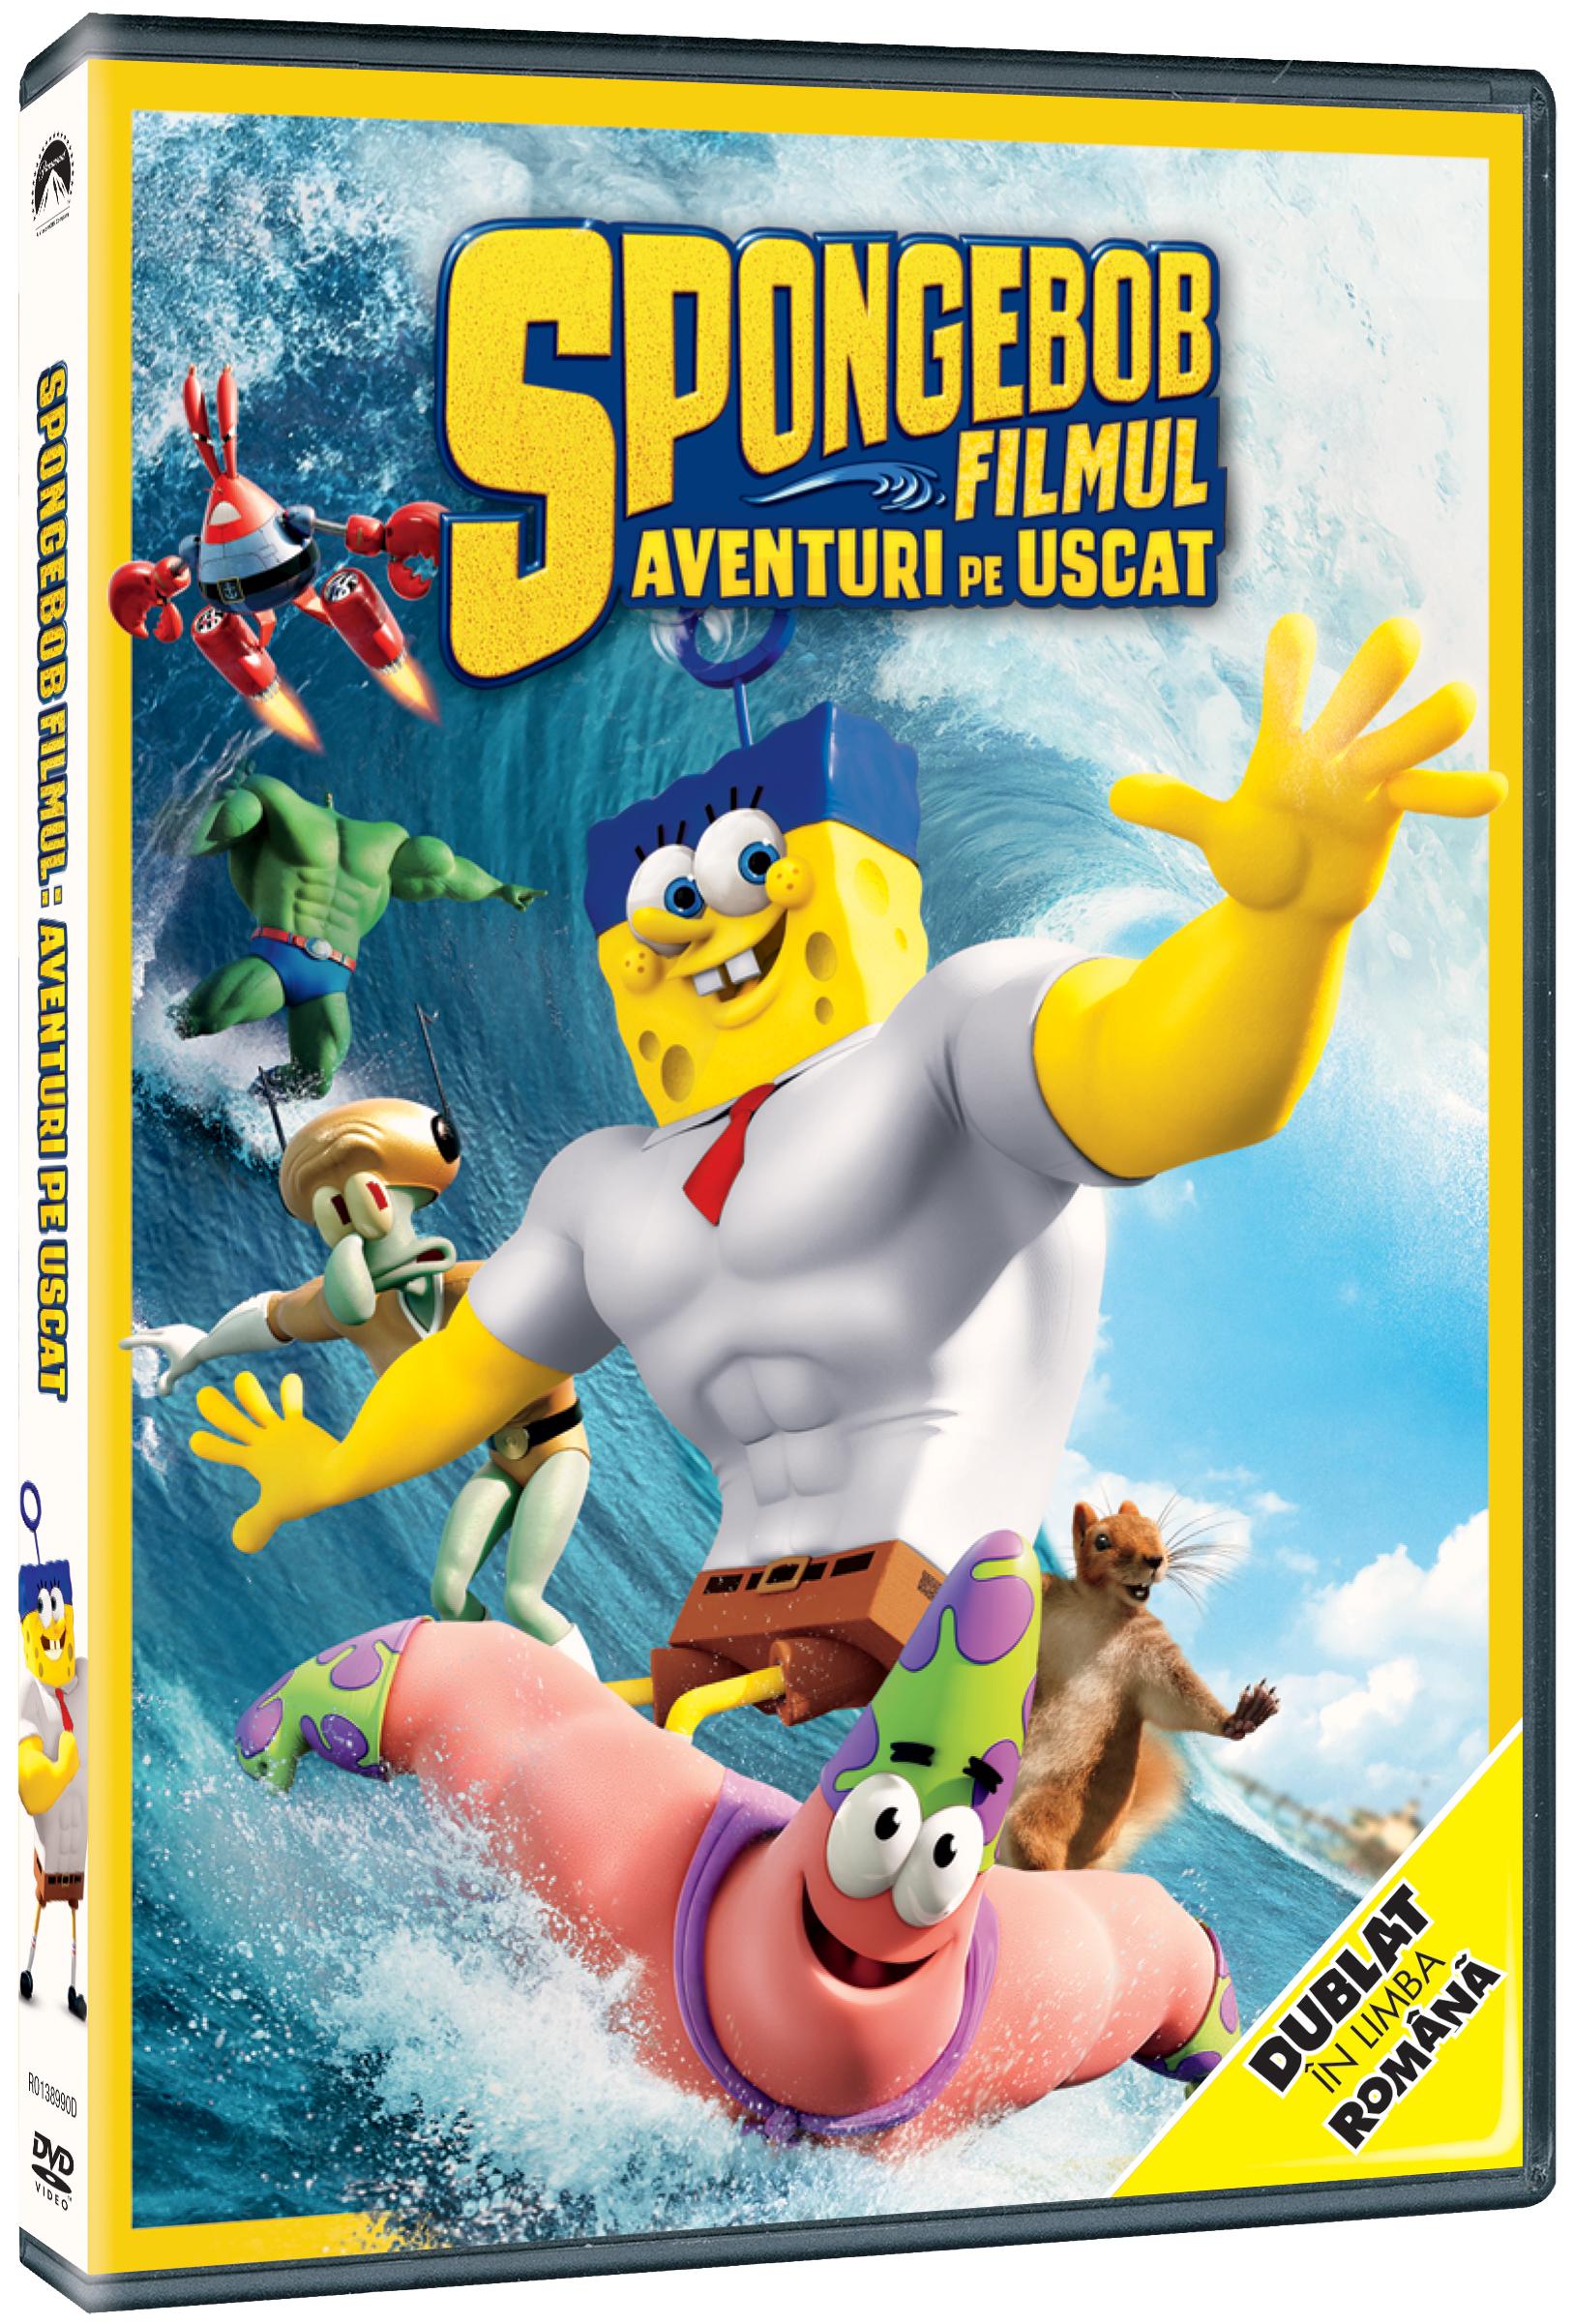 SpongeBob - Aventuri pe uscat / The SpongeBob Movie: Sponge Out of Water